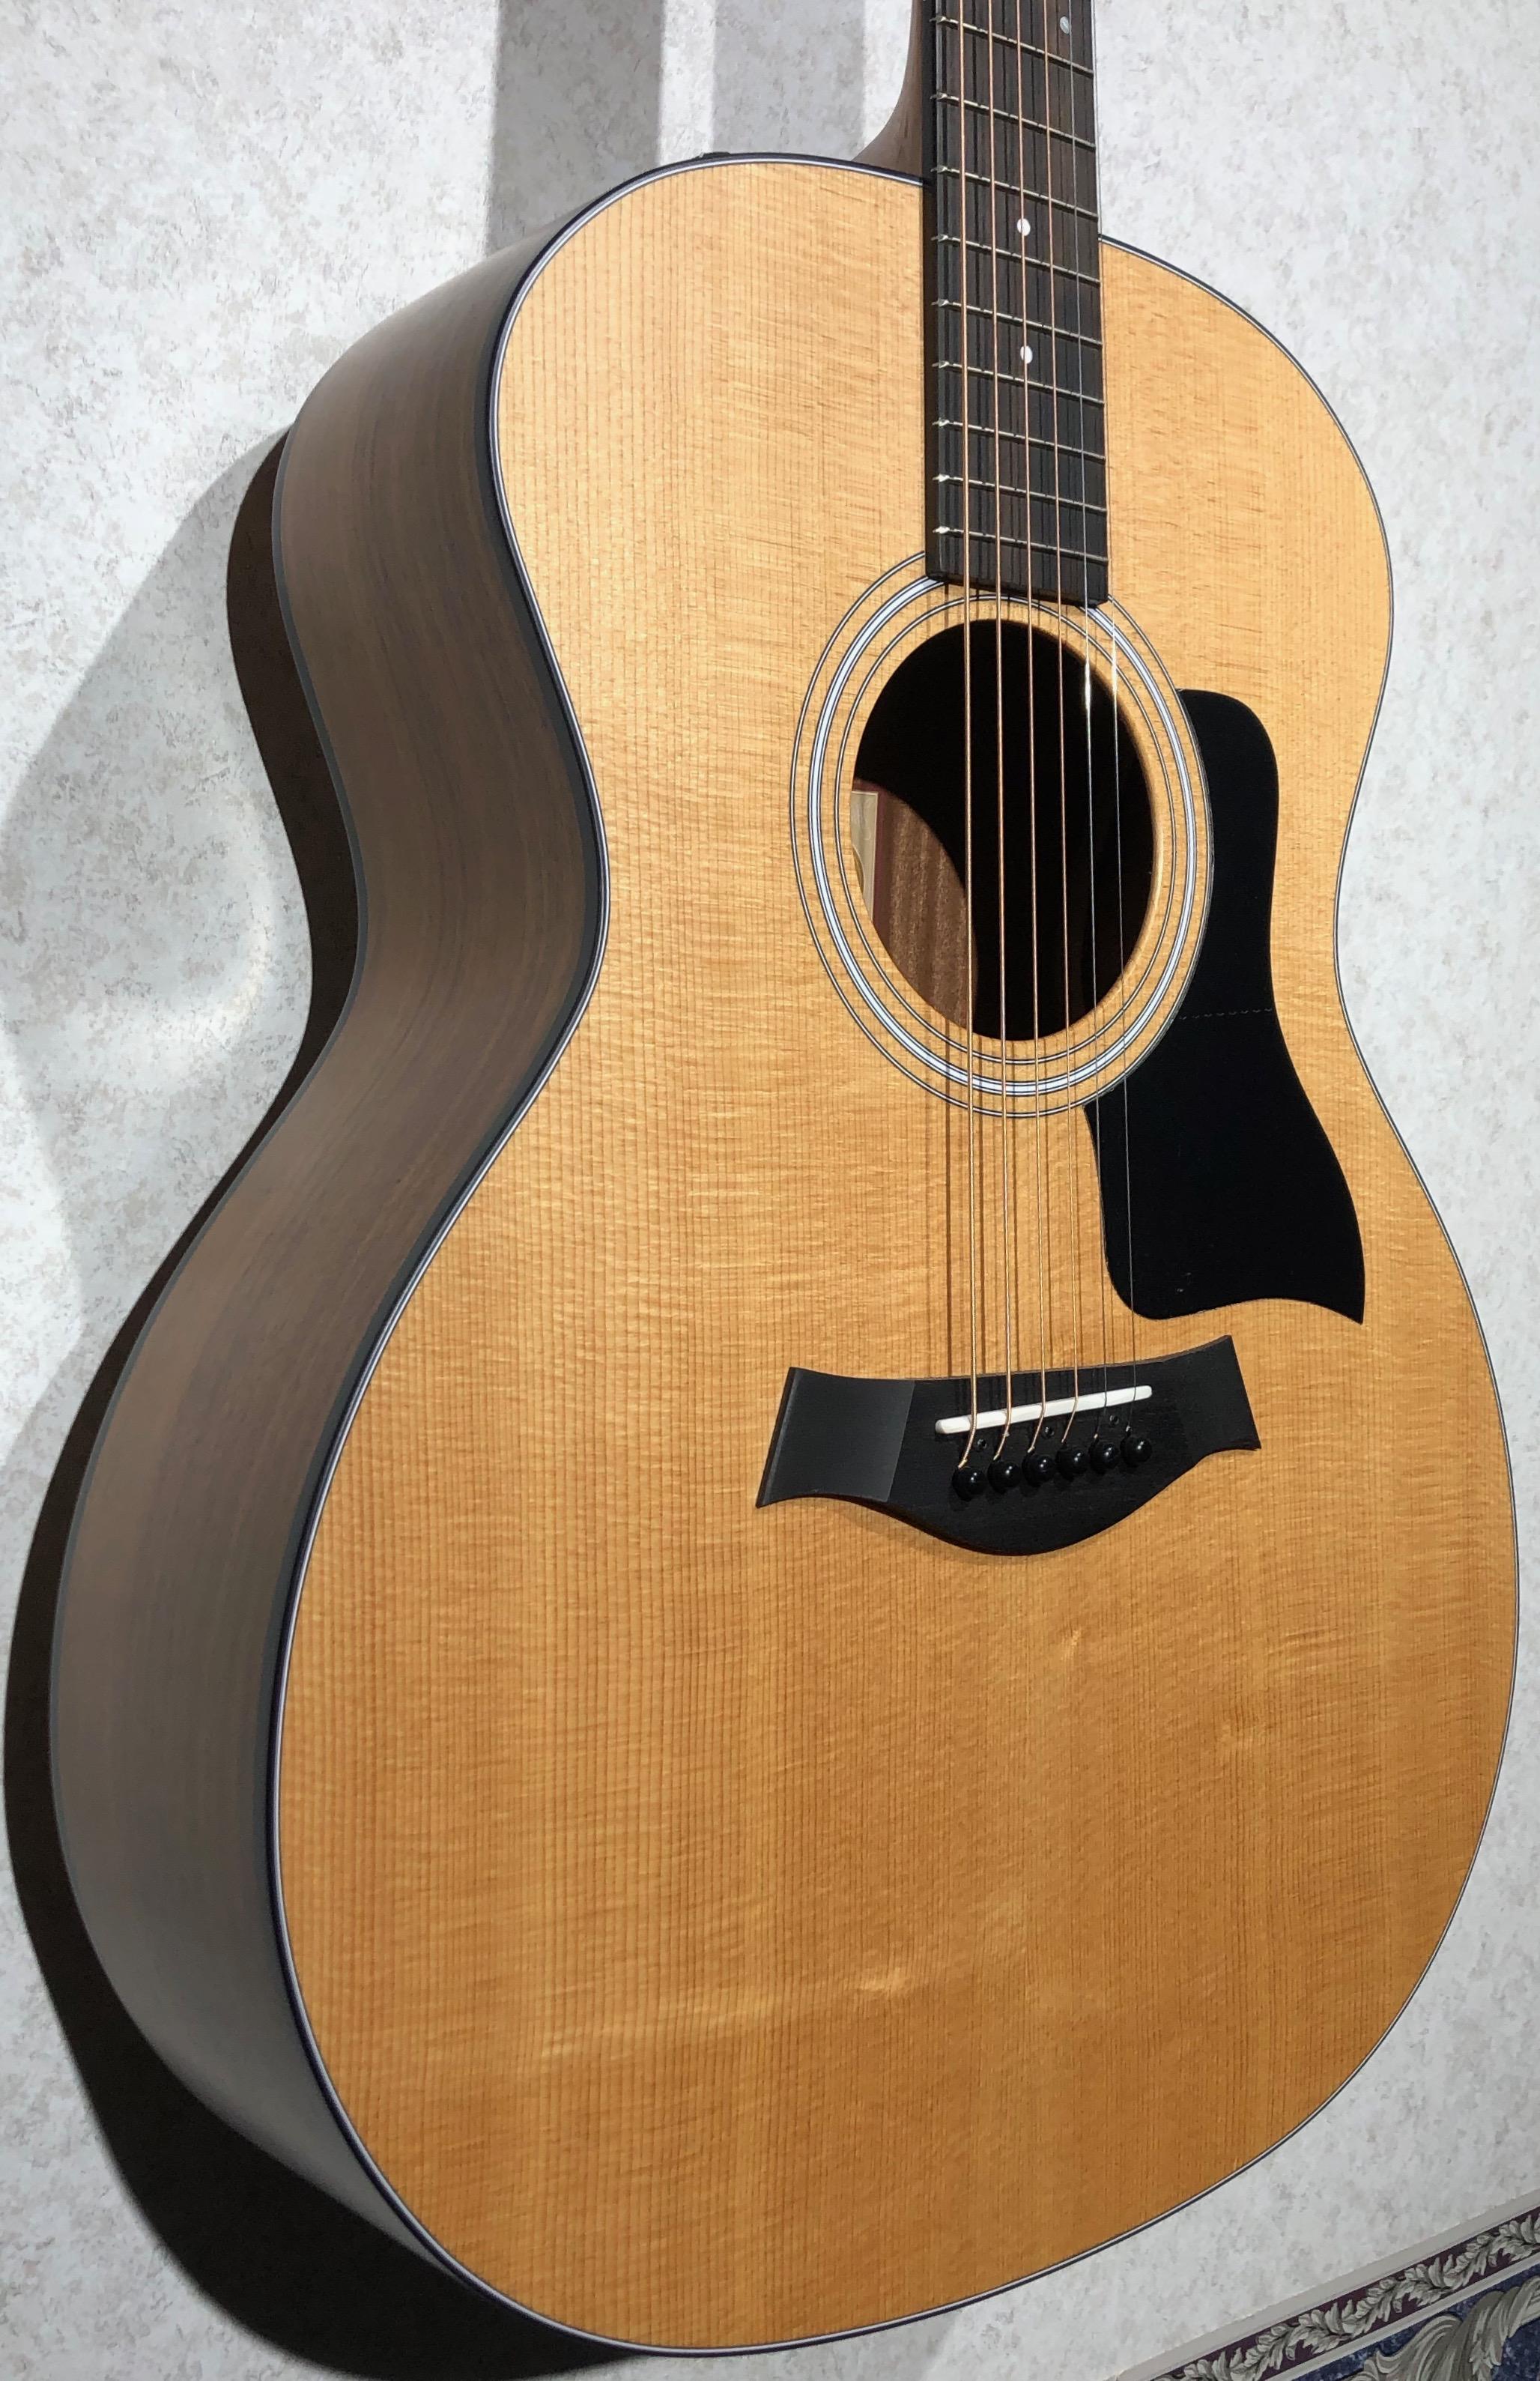 taylor guitars 114e legacy music. Black Bedroom Furniture Sets. Home Design Ideas